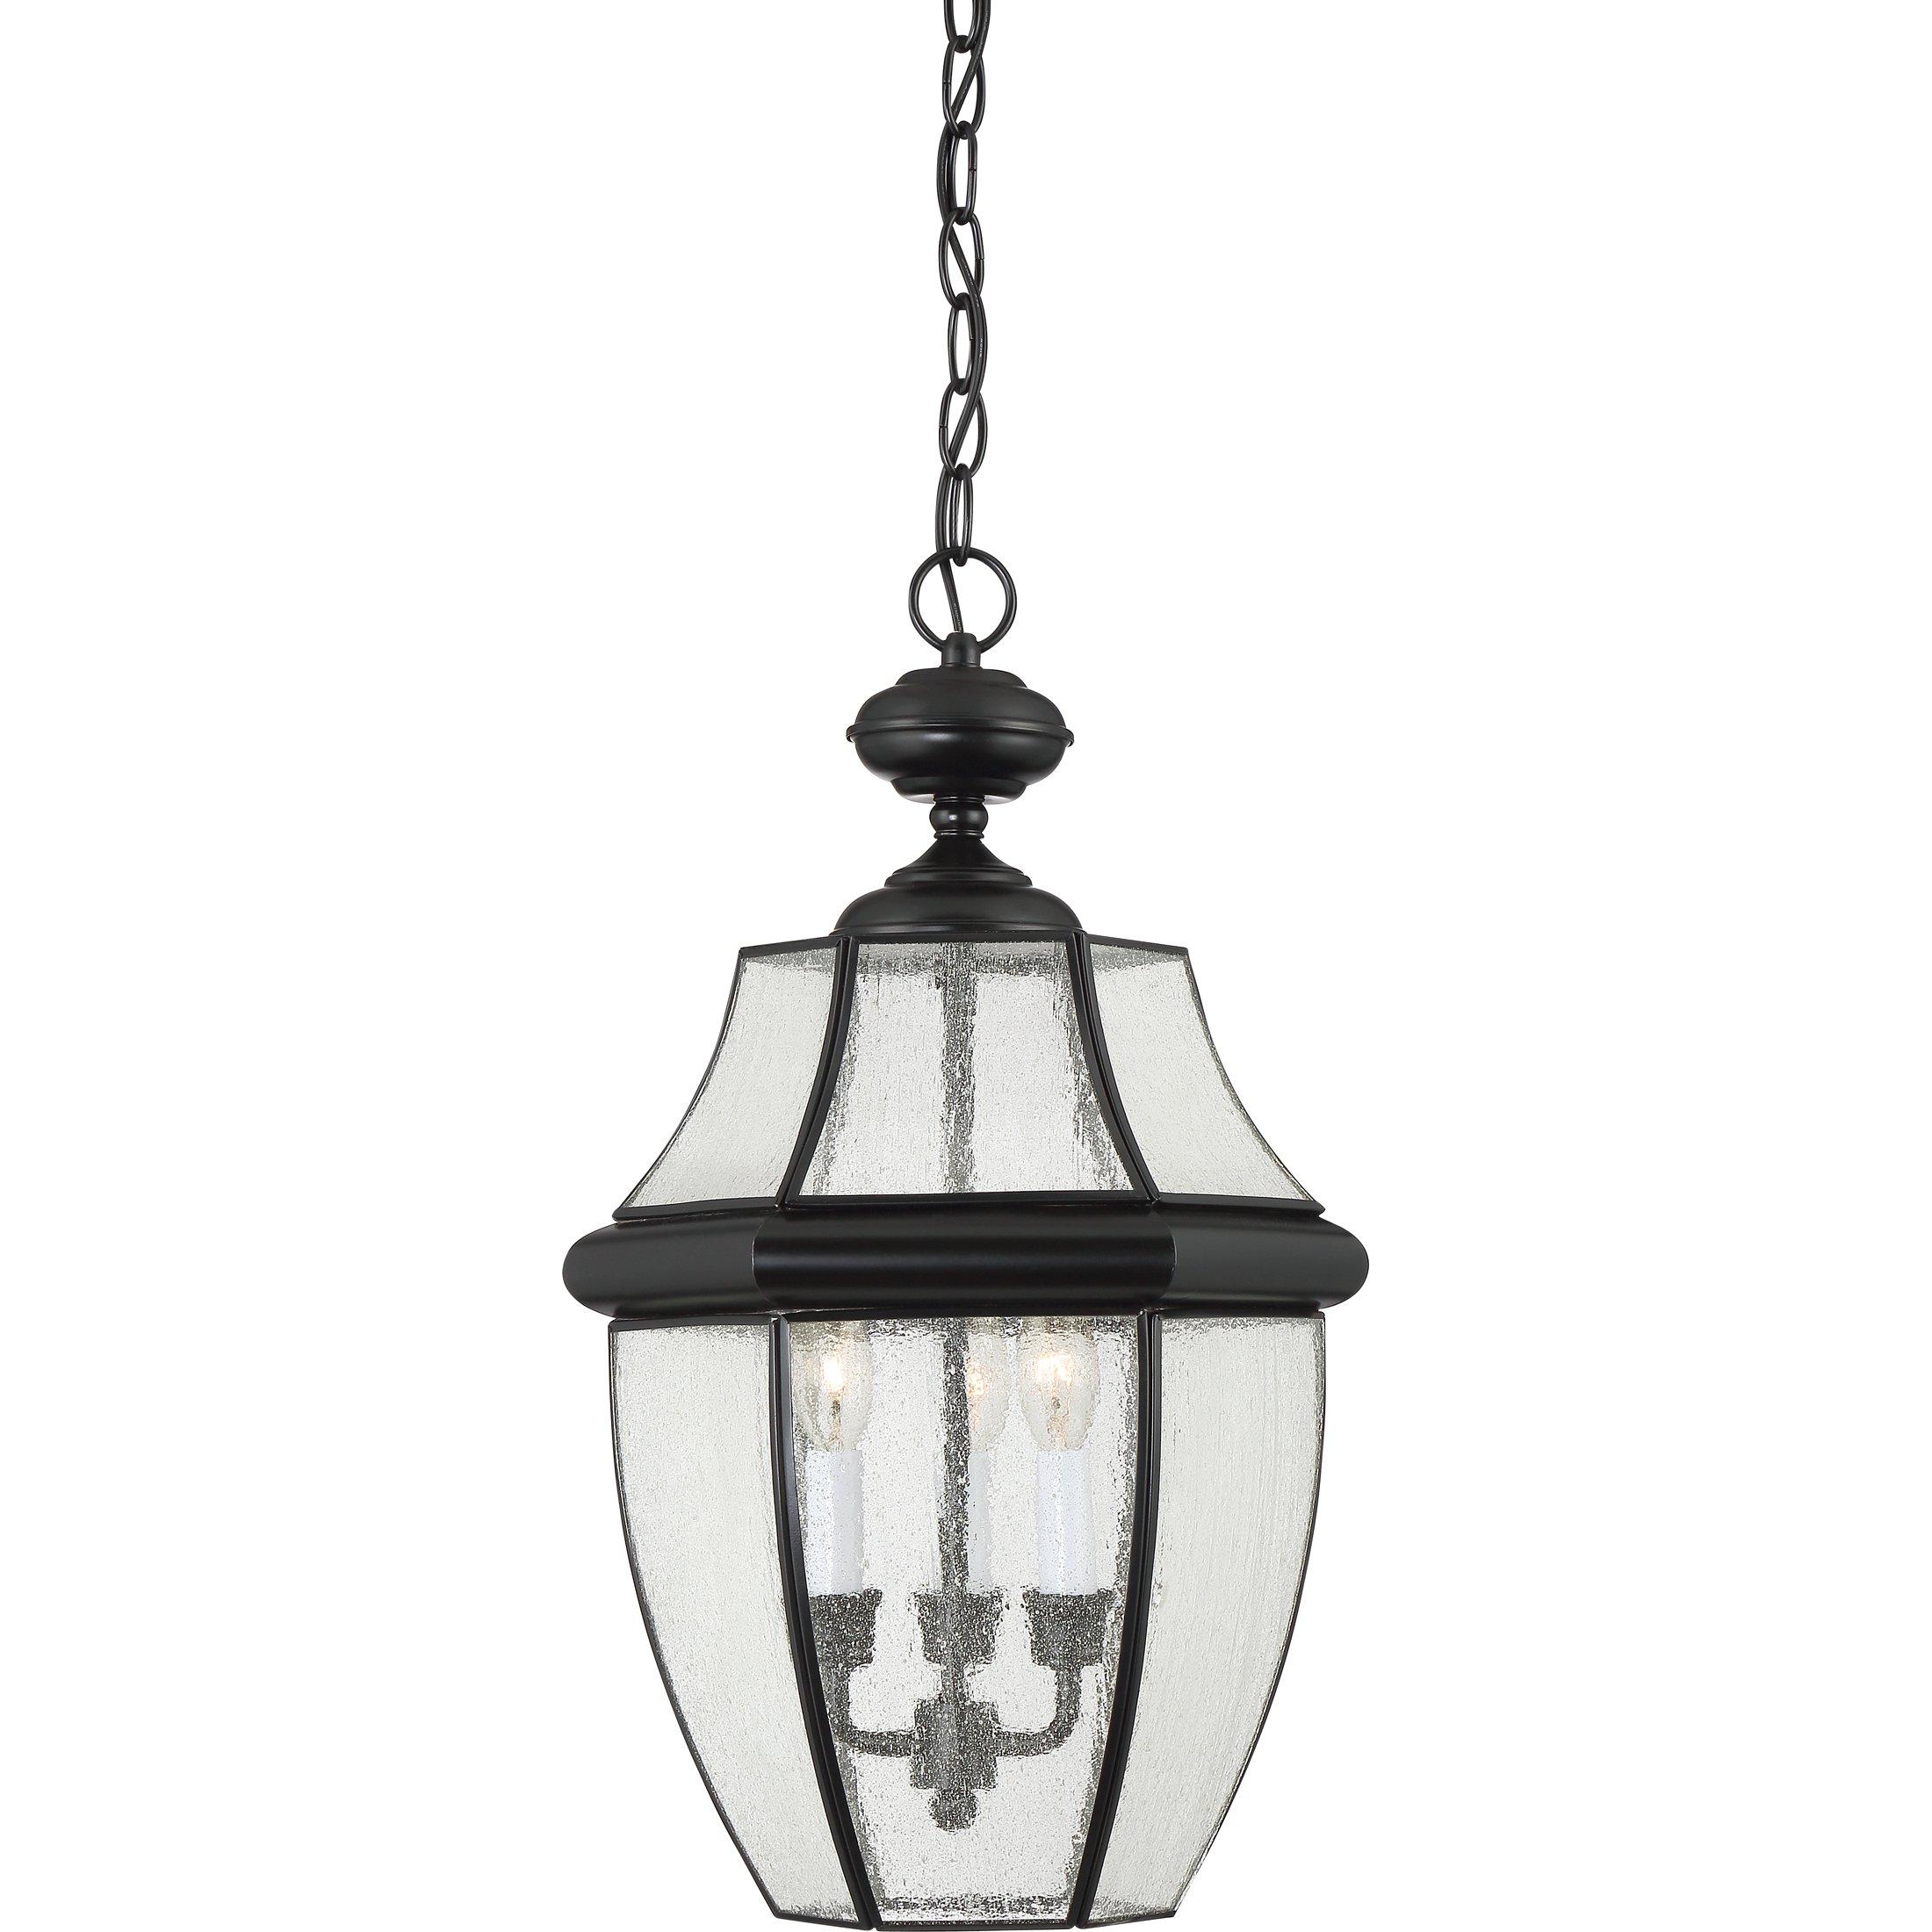 Quoizel NY1912K Three Light Outdoor Hanging Lantern